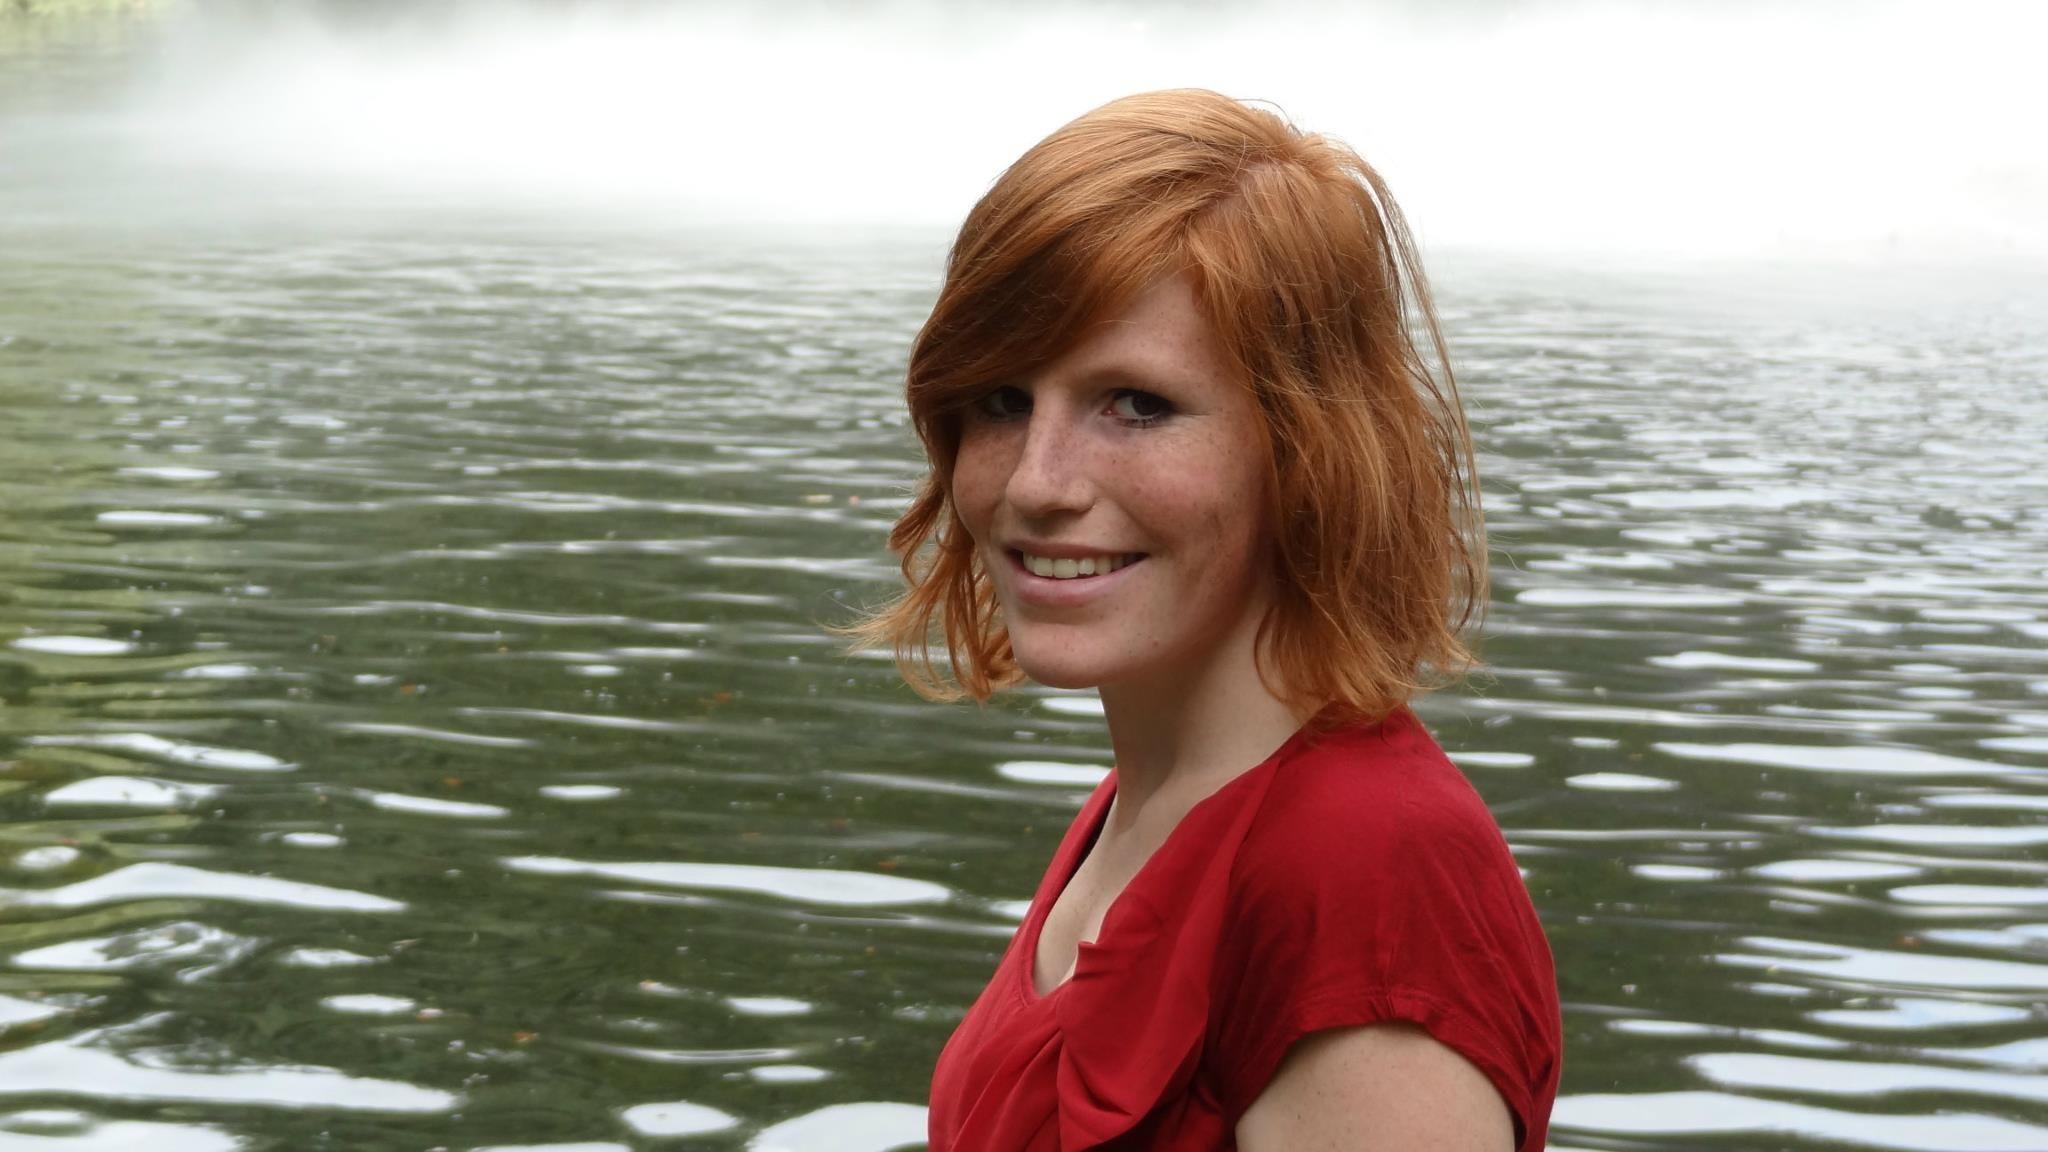 Pin von Mike Herbst auf extraordinary redheads & gingers